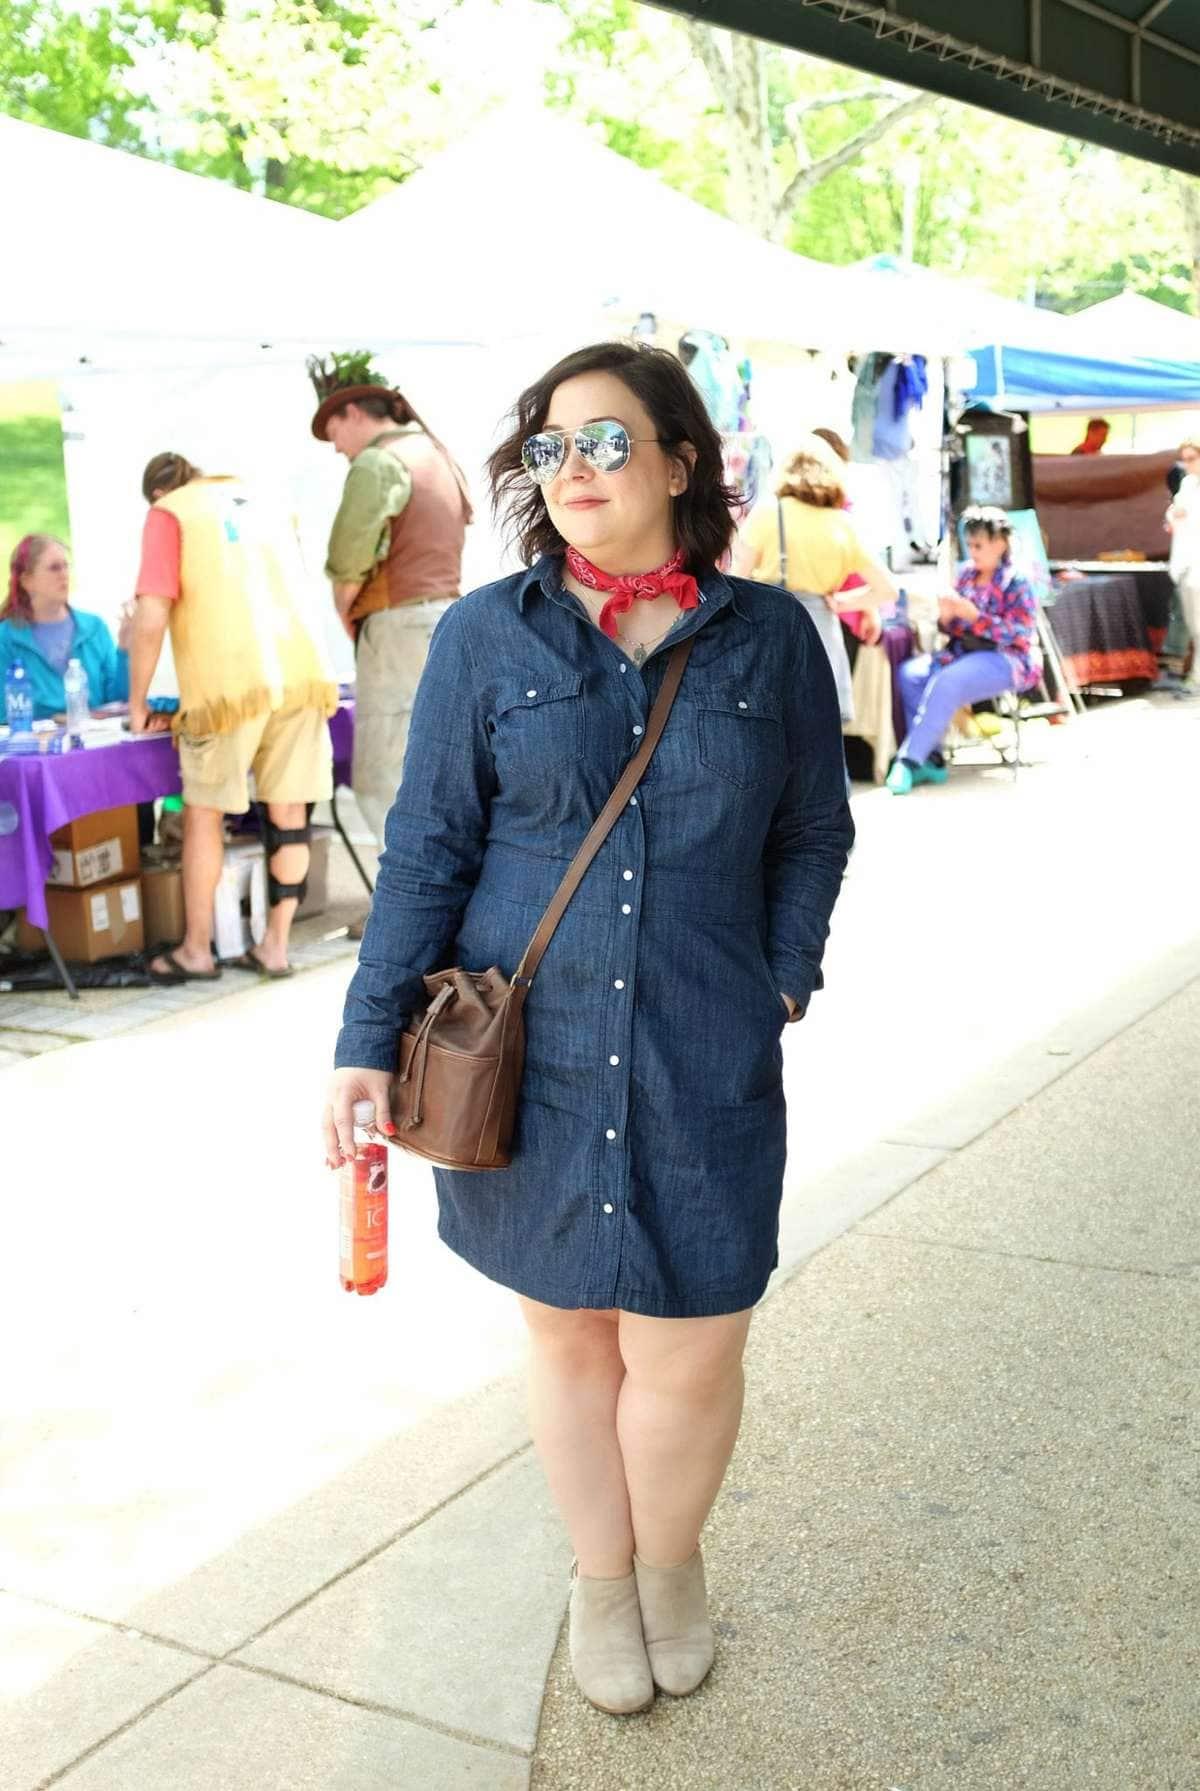 Wardrobe Oxygen in a Boden denim dress, vintage Coach bag and Clarks booties